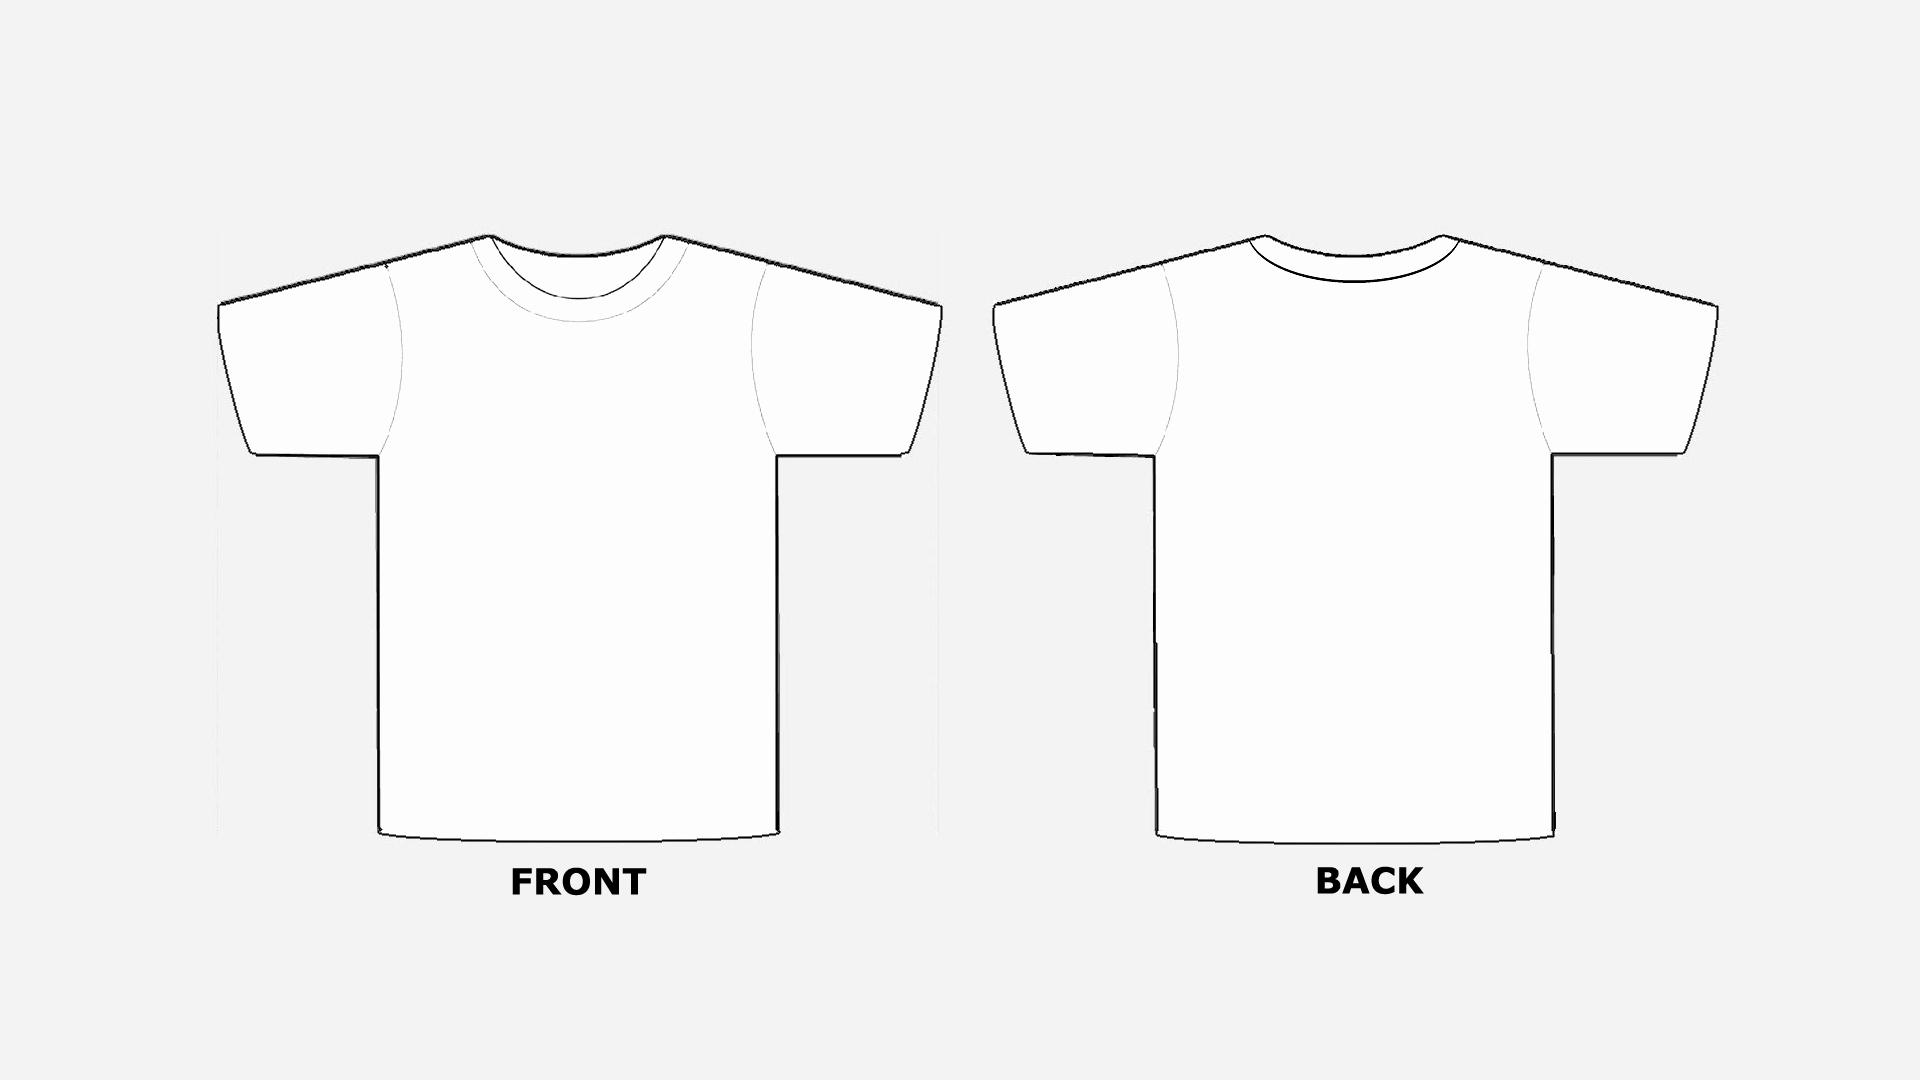 Printable T Shirt Templates Inspirational Blank Tshirt Template Printable In Hd Hd Wallpapers